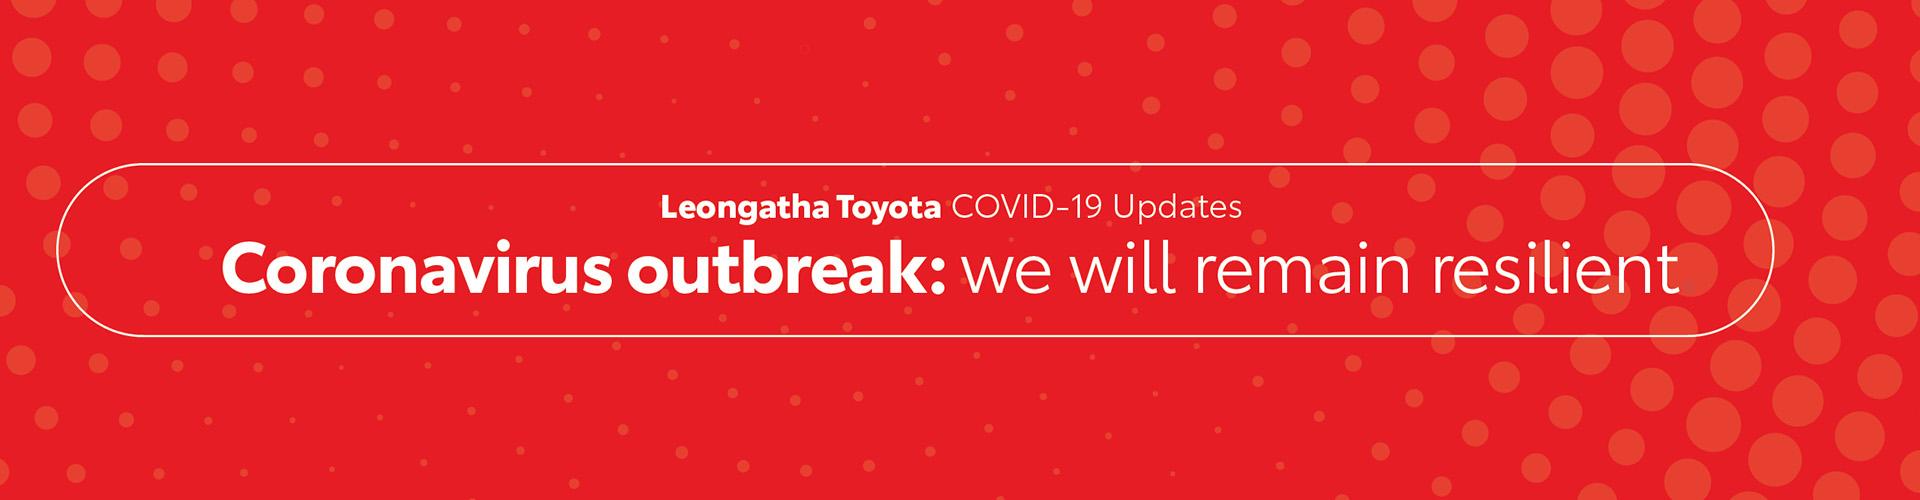 Leongatha Toyota COVID-19